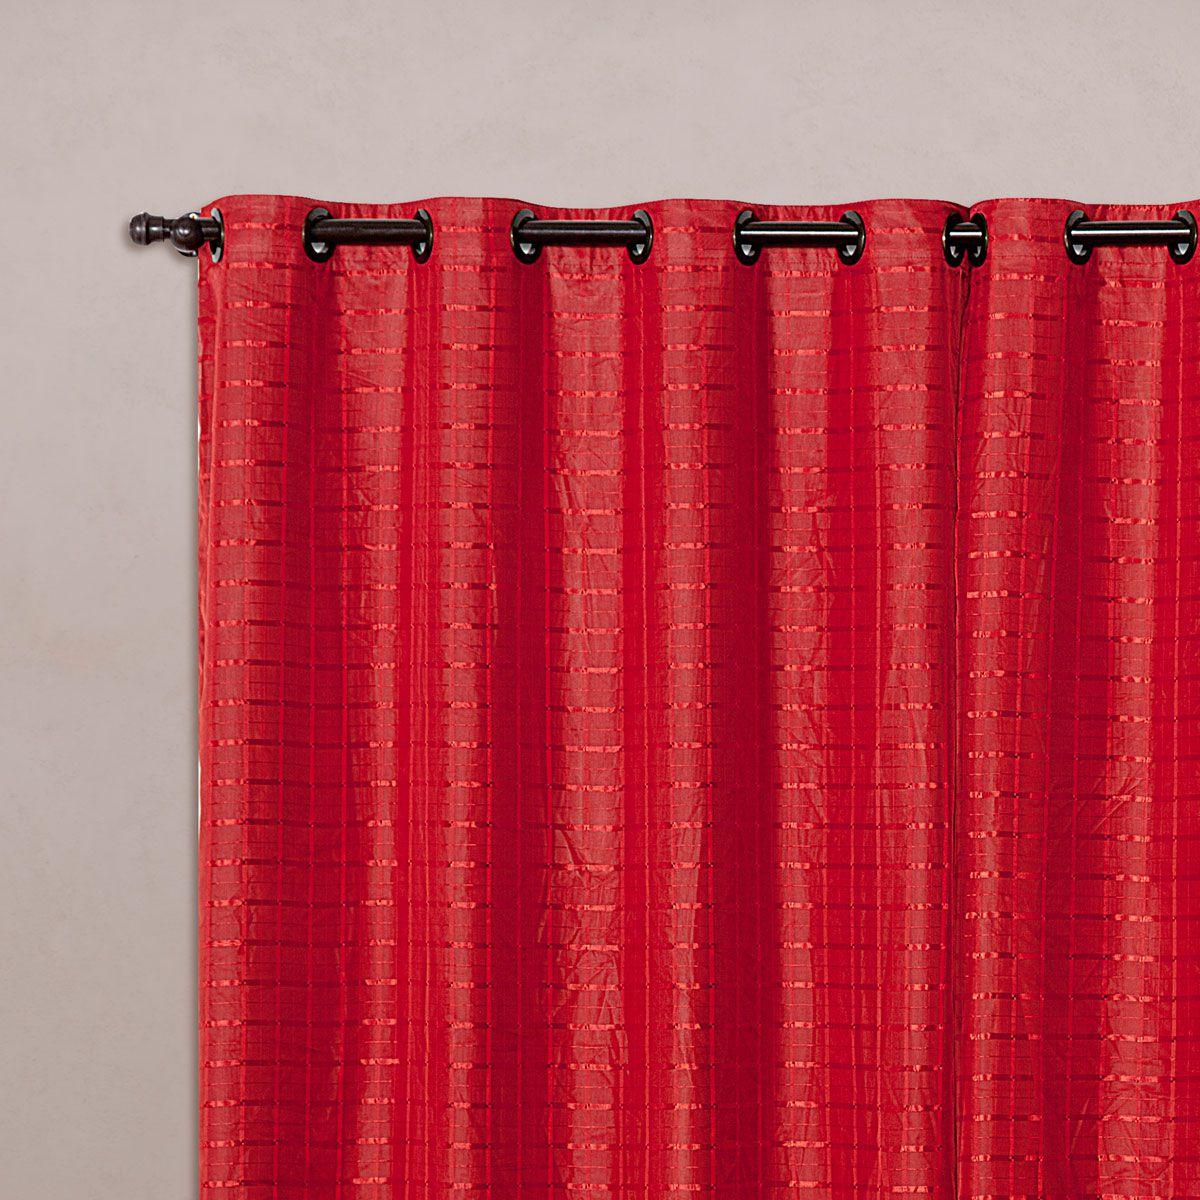 Cortina Blackout PVC c/ Voil Xadrez Vermelho Corta Luz 2,80m X 1,60m